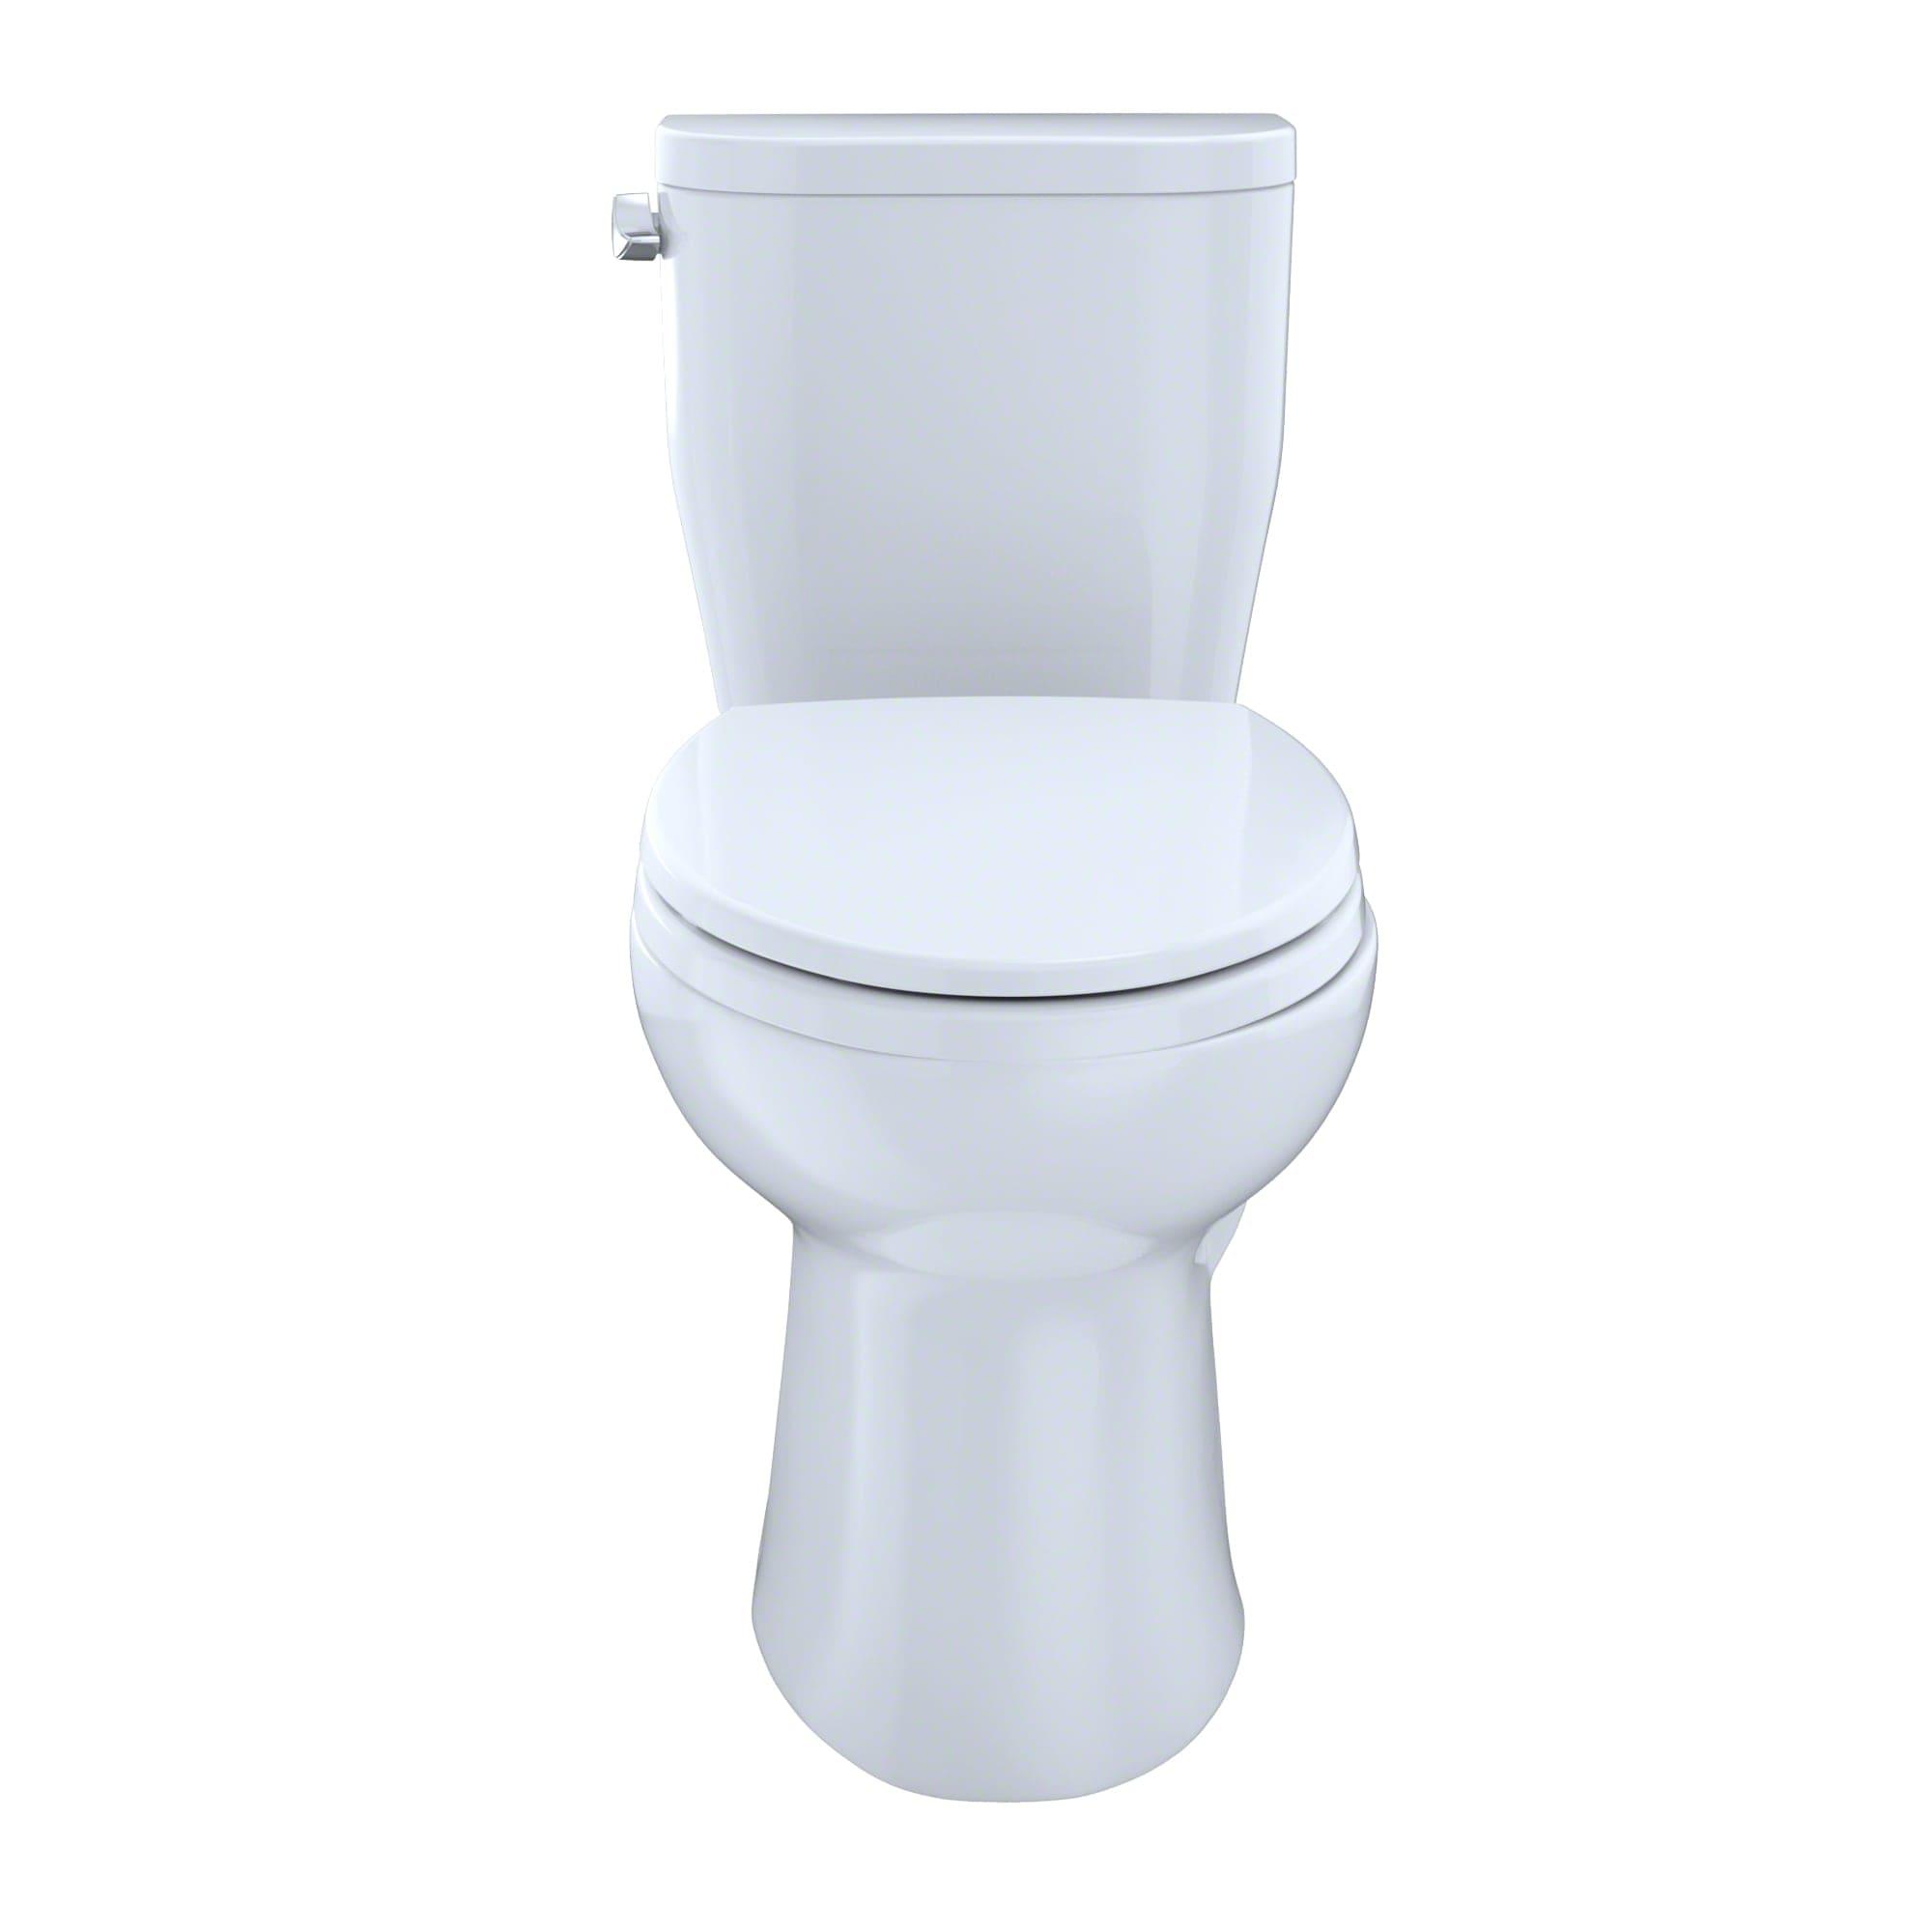 Toto CST244EF#01 Cotton Entrada 1.28 GPF Two-Piece Elongated Toilet ...